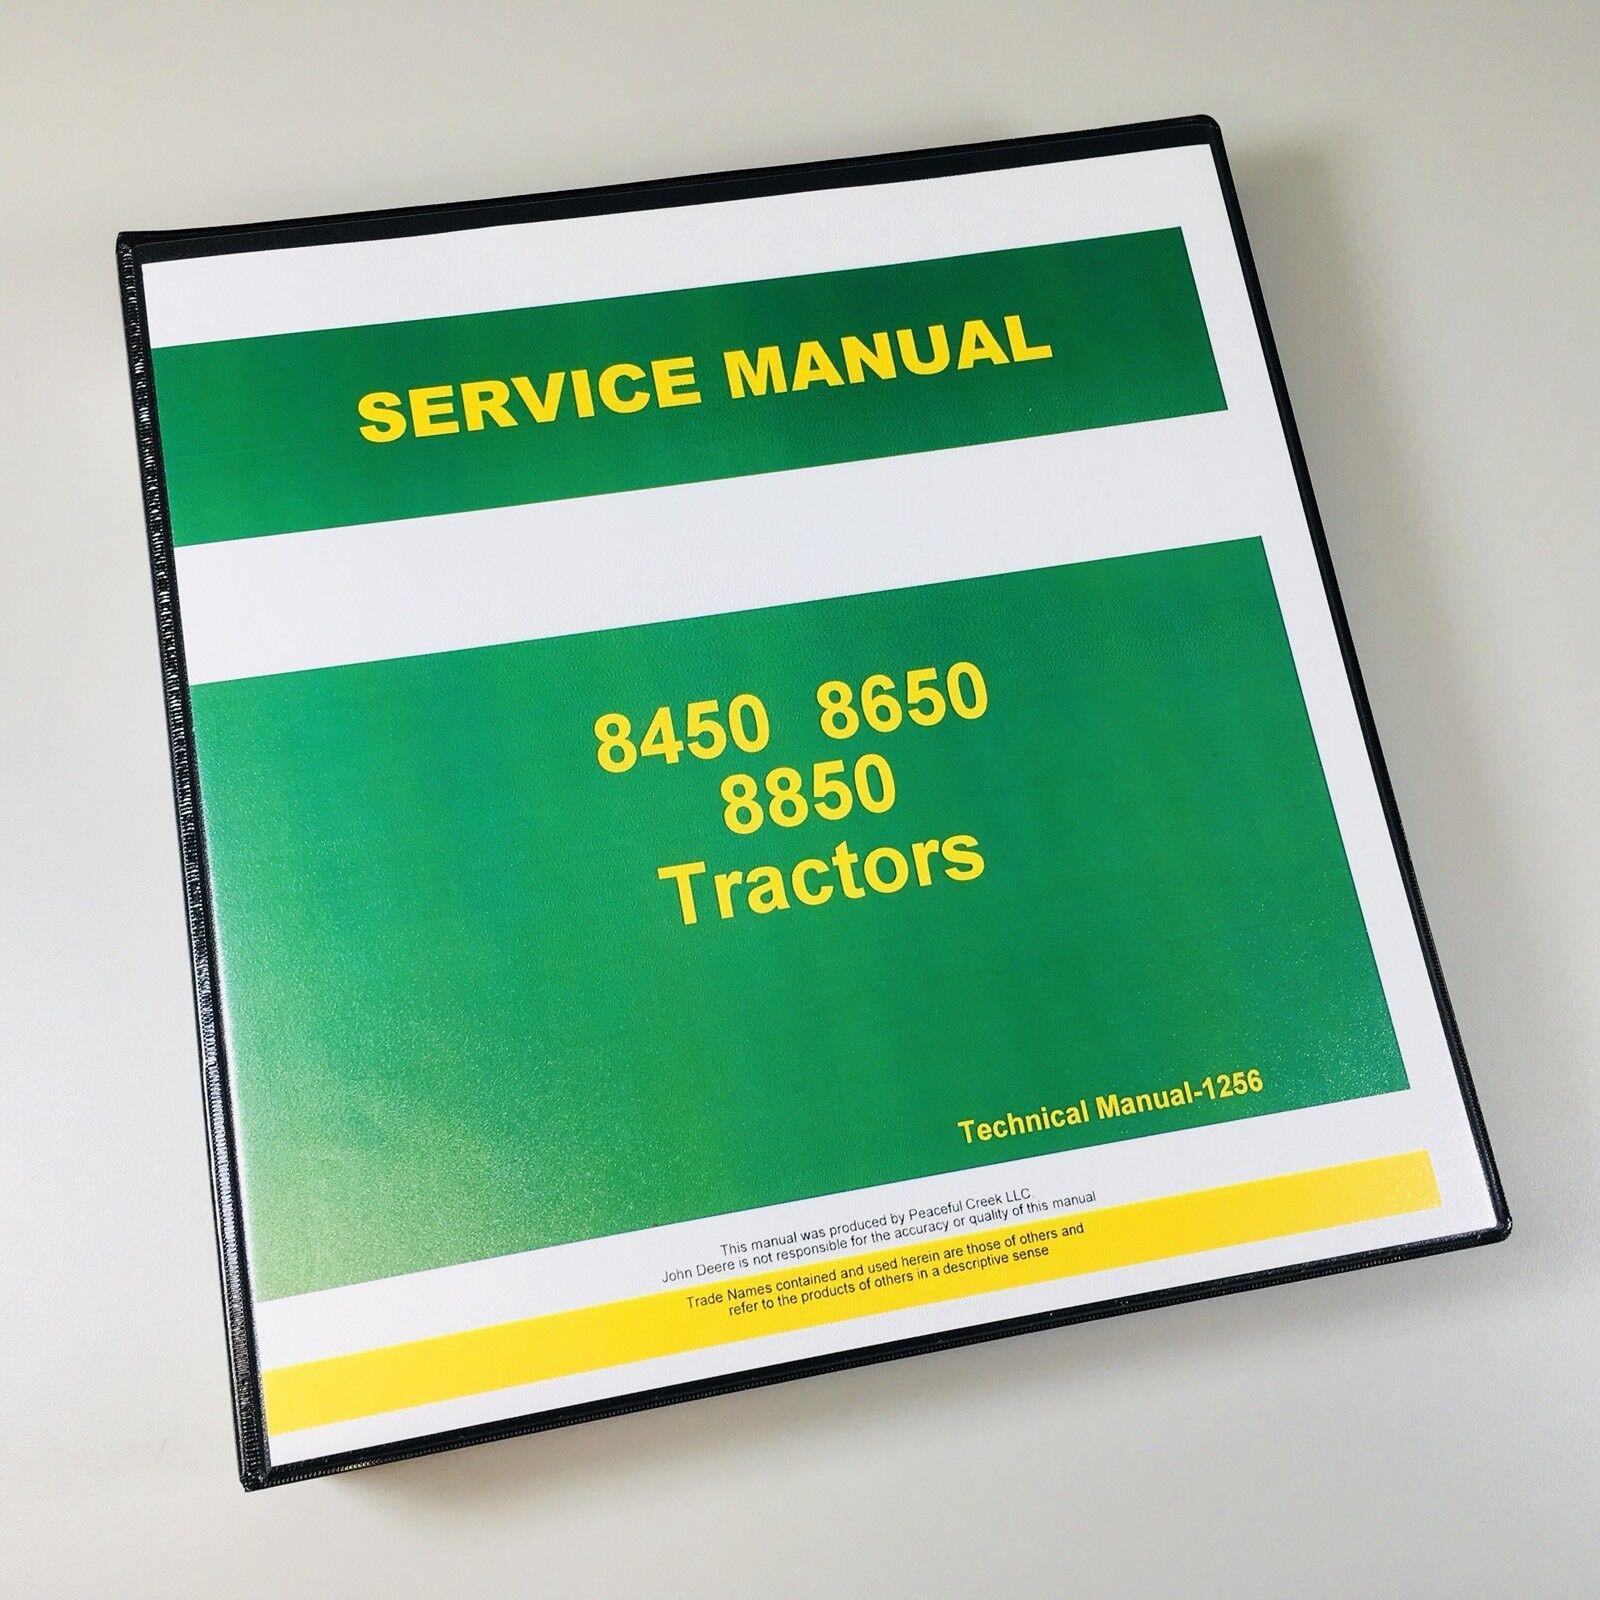 service testing manual for john deere 8450 8650 8850 tractor repair rh ebay com john deere 8450 manual john deere 850 manual pdf